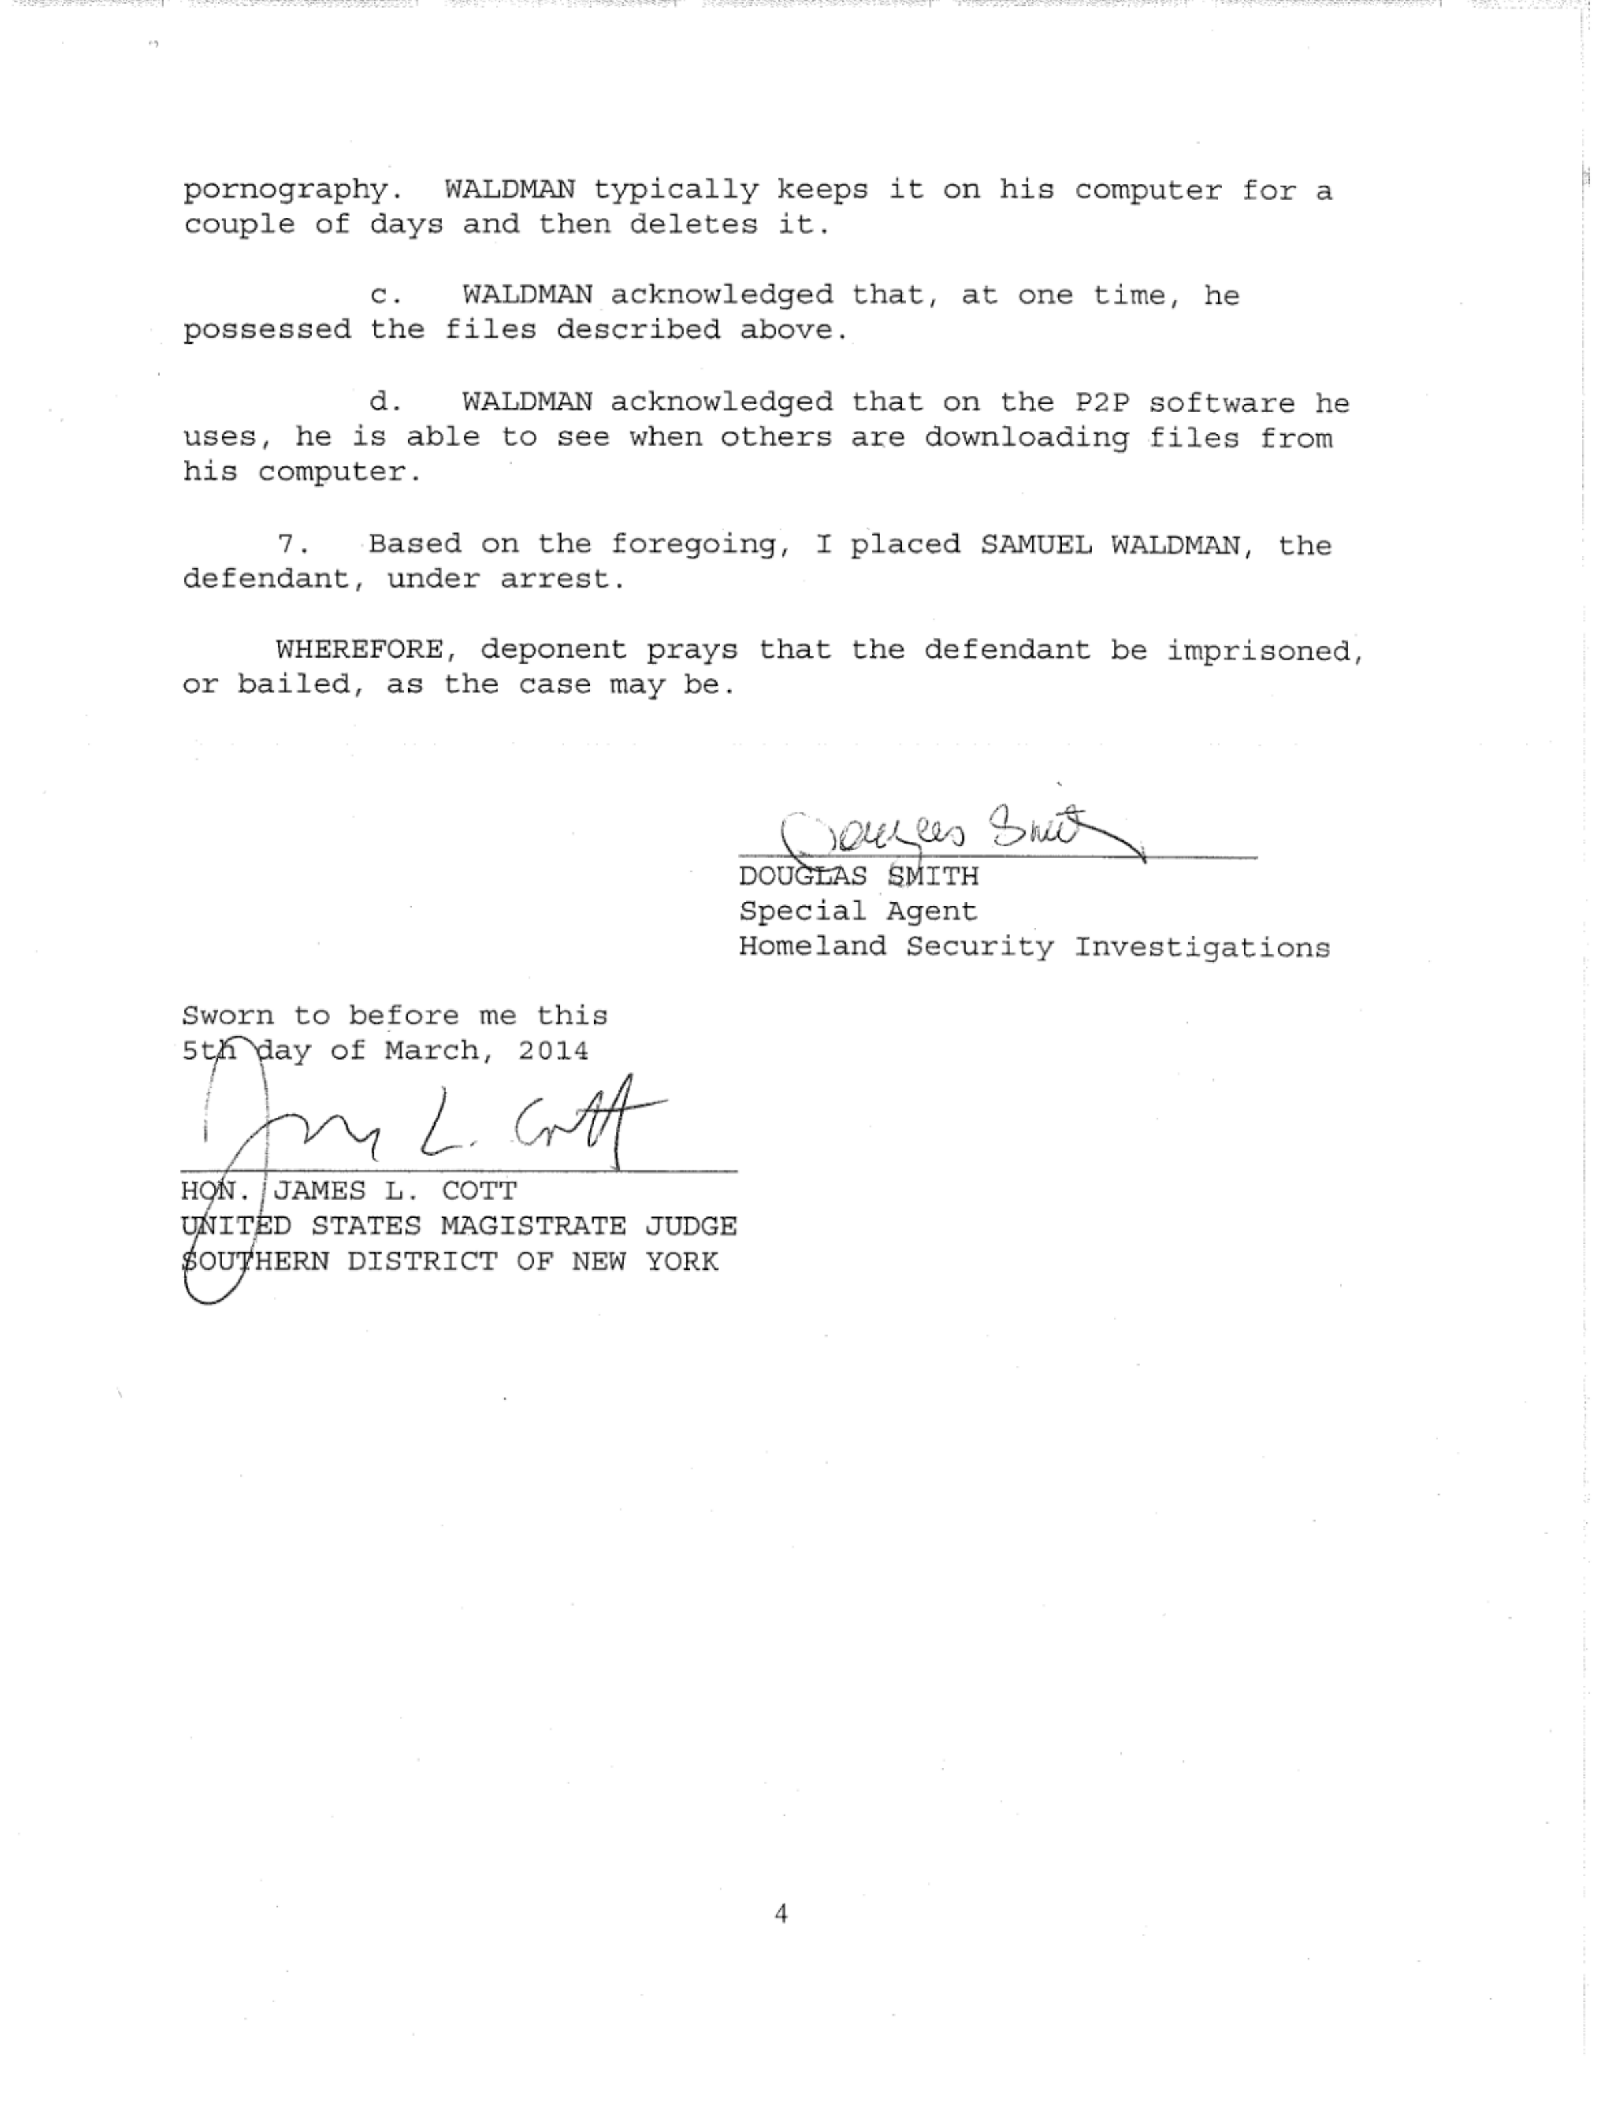 Copy of USA-v-Samuel-Waldeman4.png